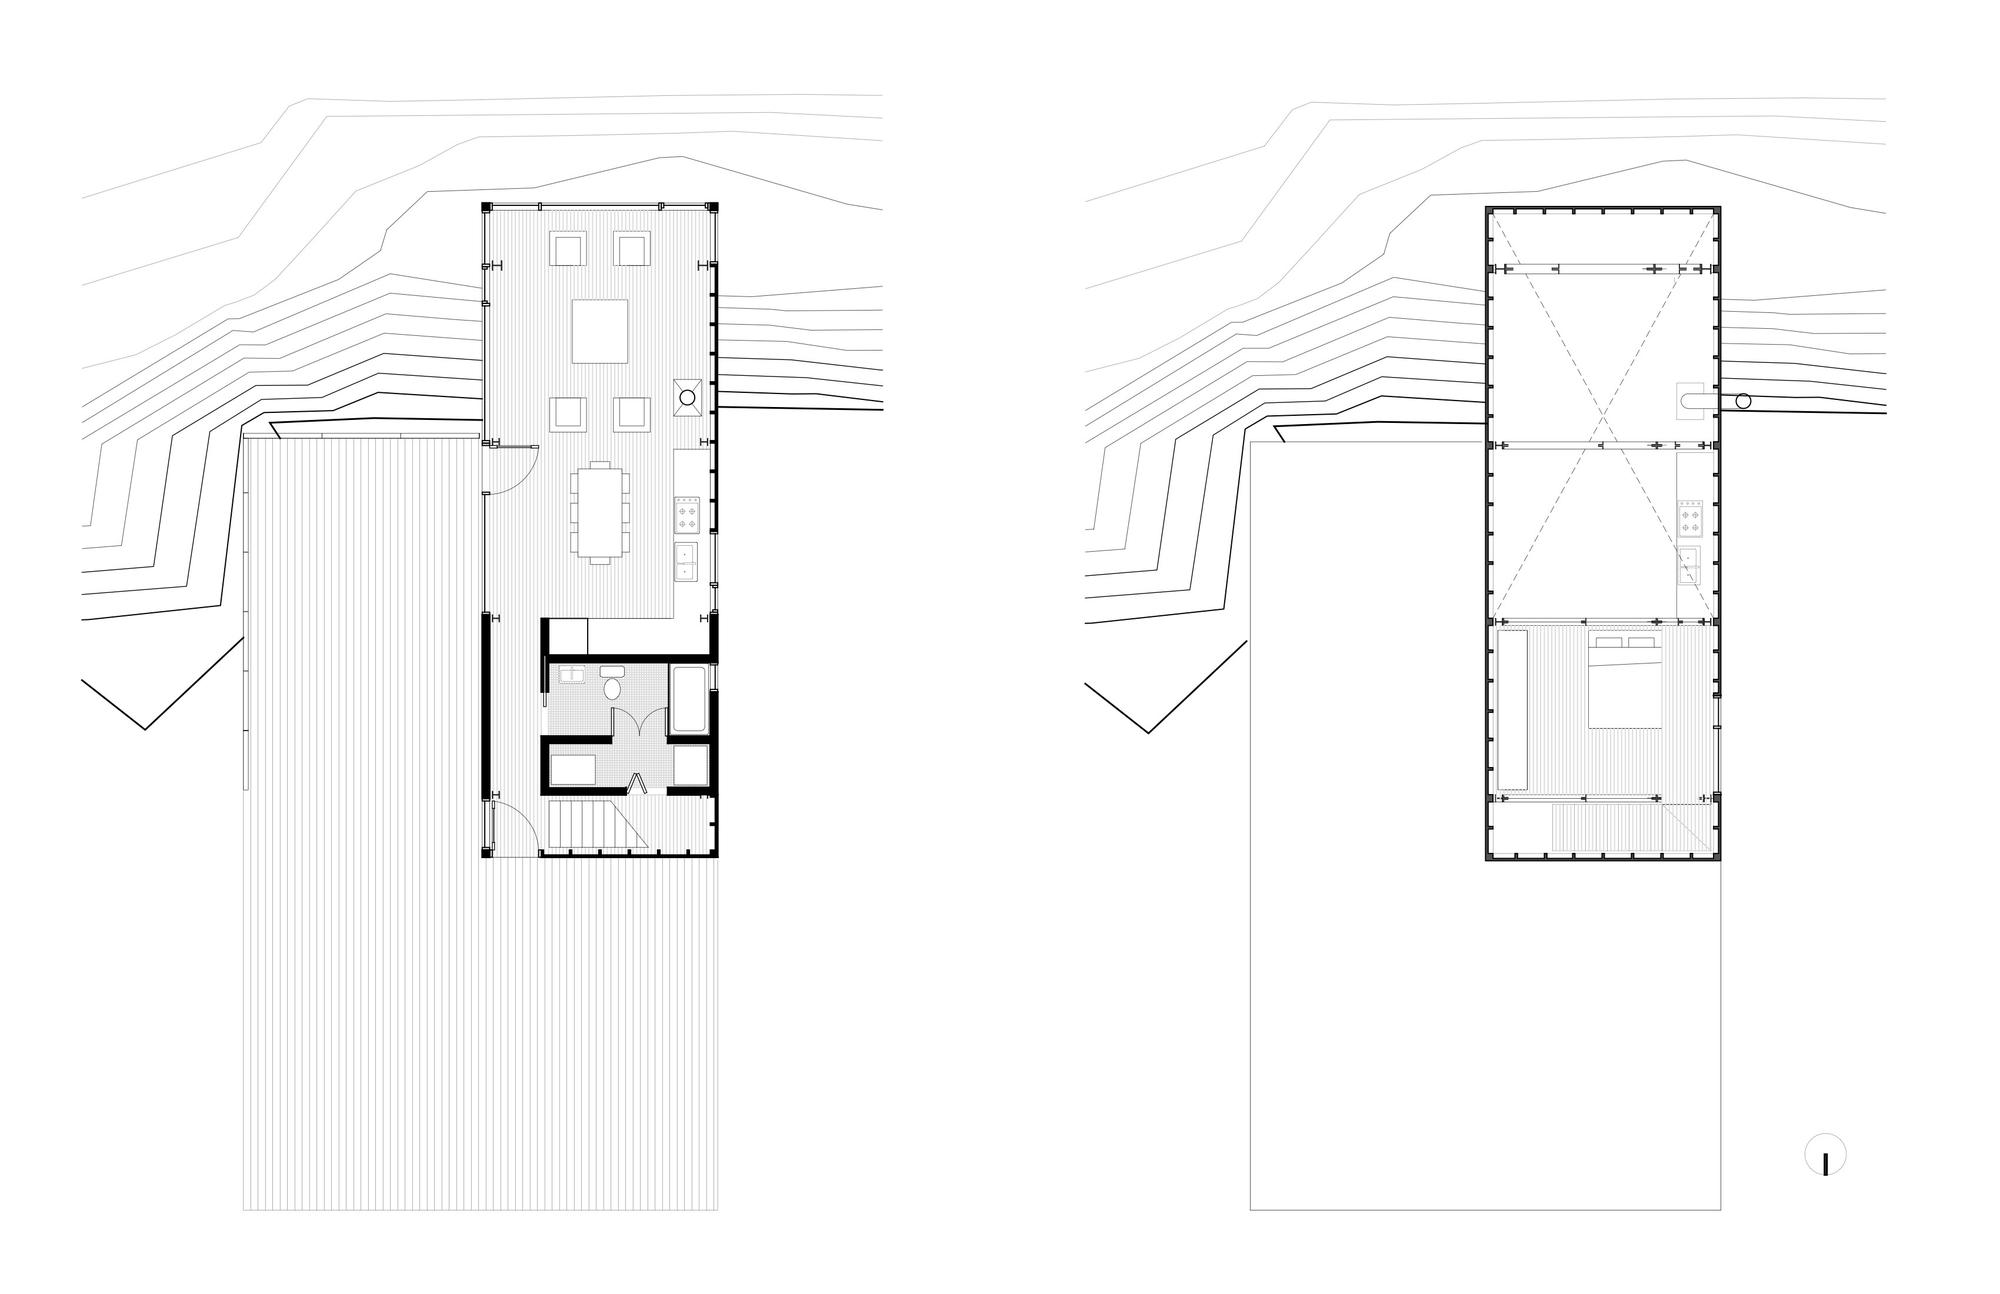 Floor Plan, Cliff Cabin in Nova Scotia, Canada